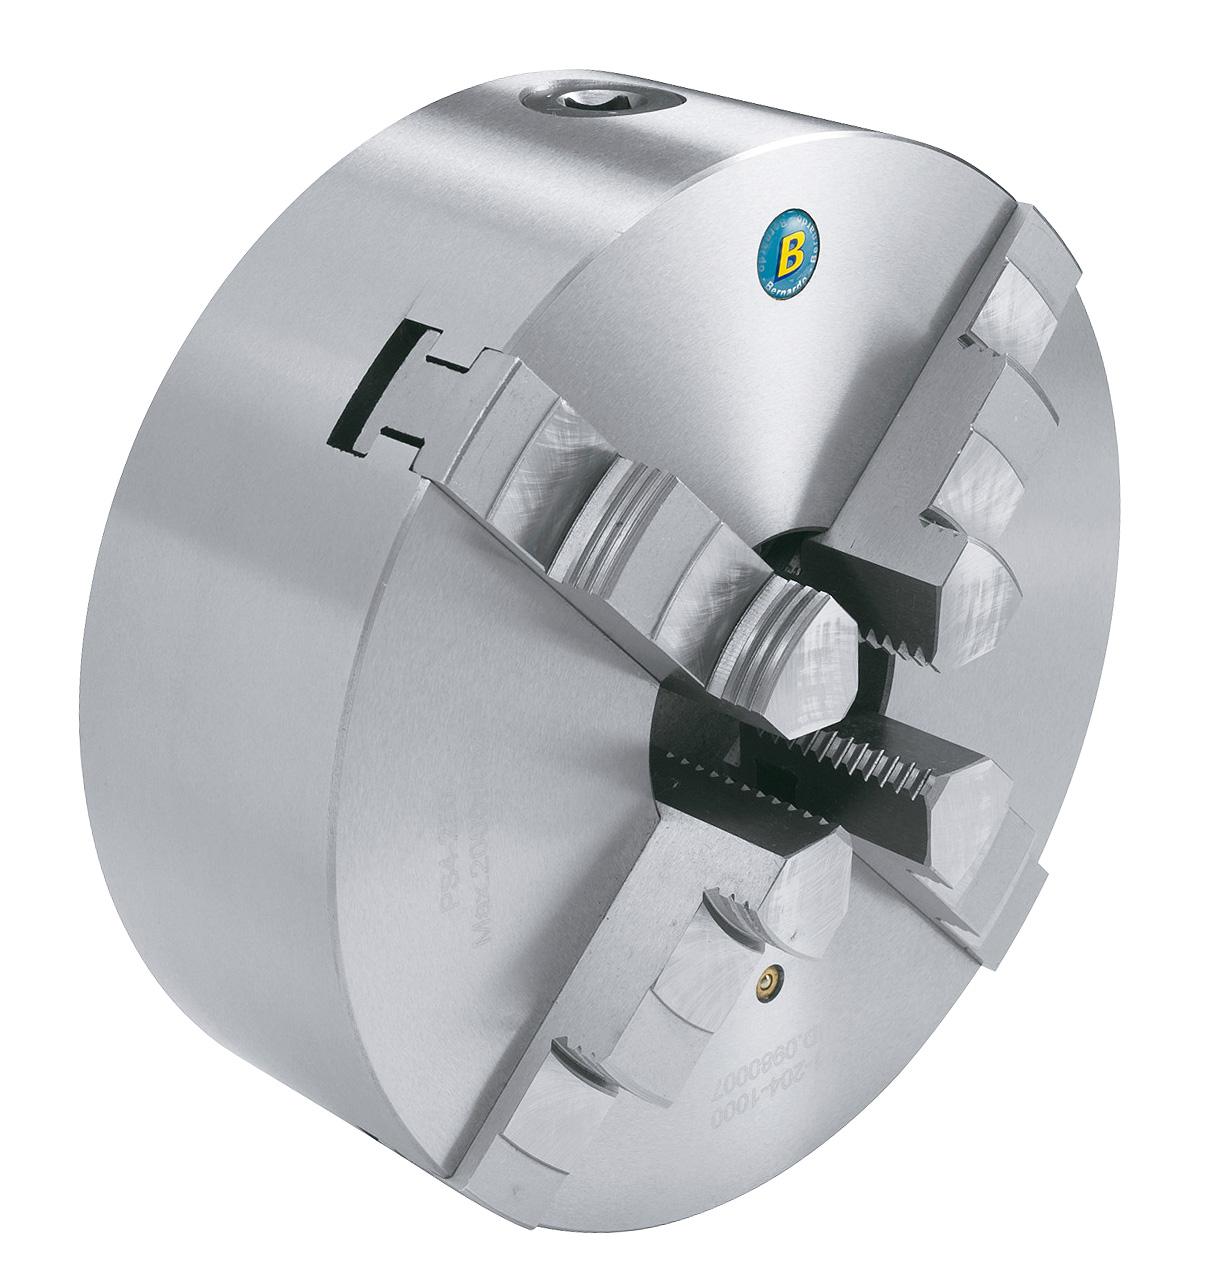 4 bakket centrerpatron standard DK12-125/D4